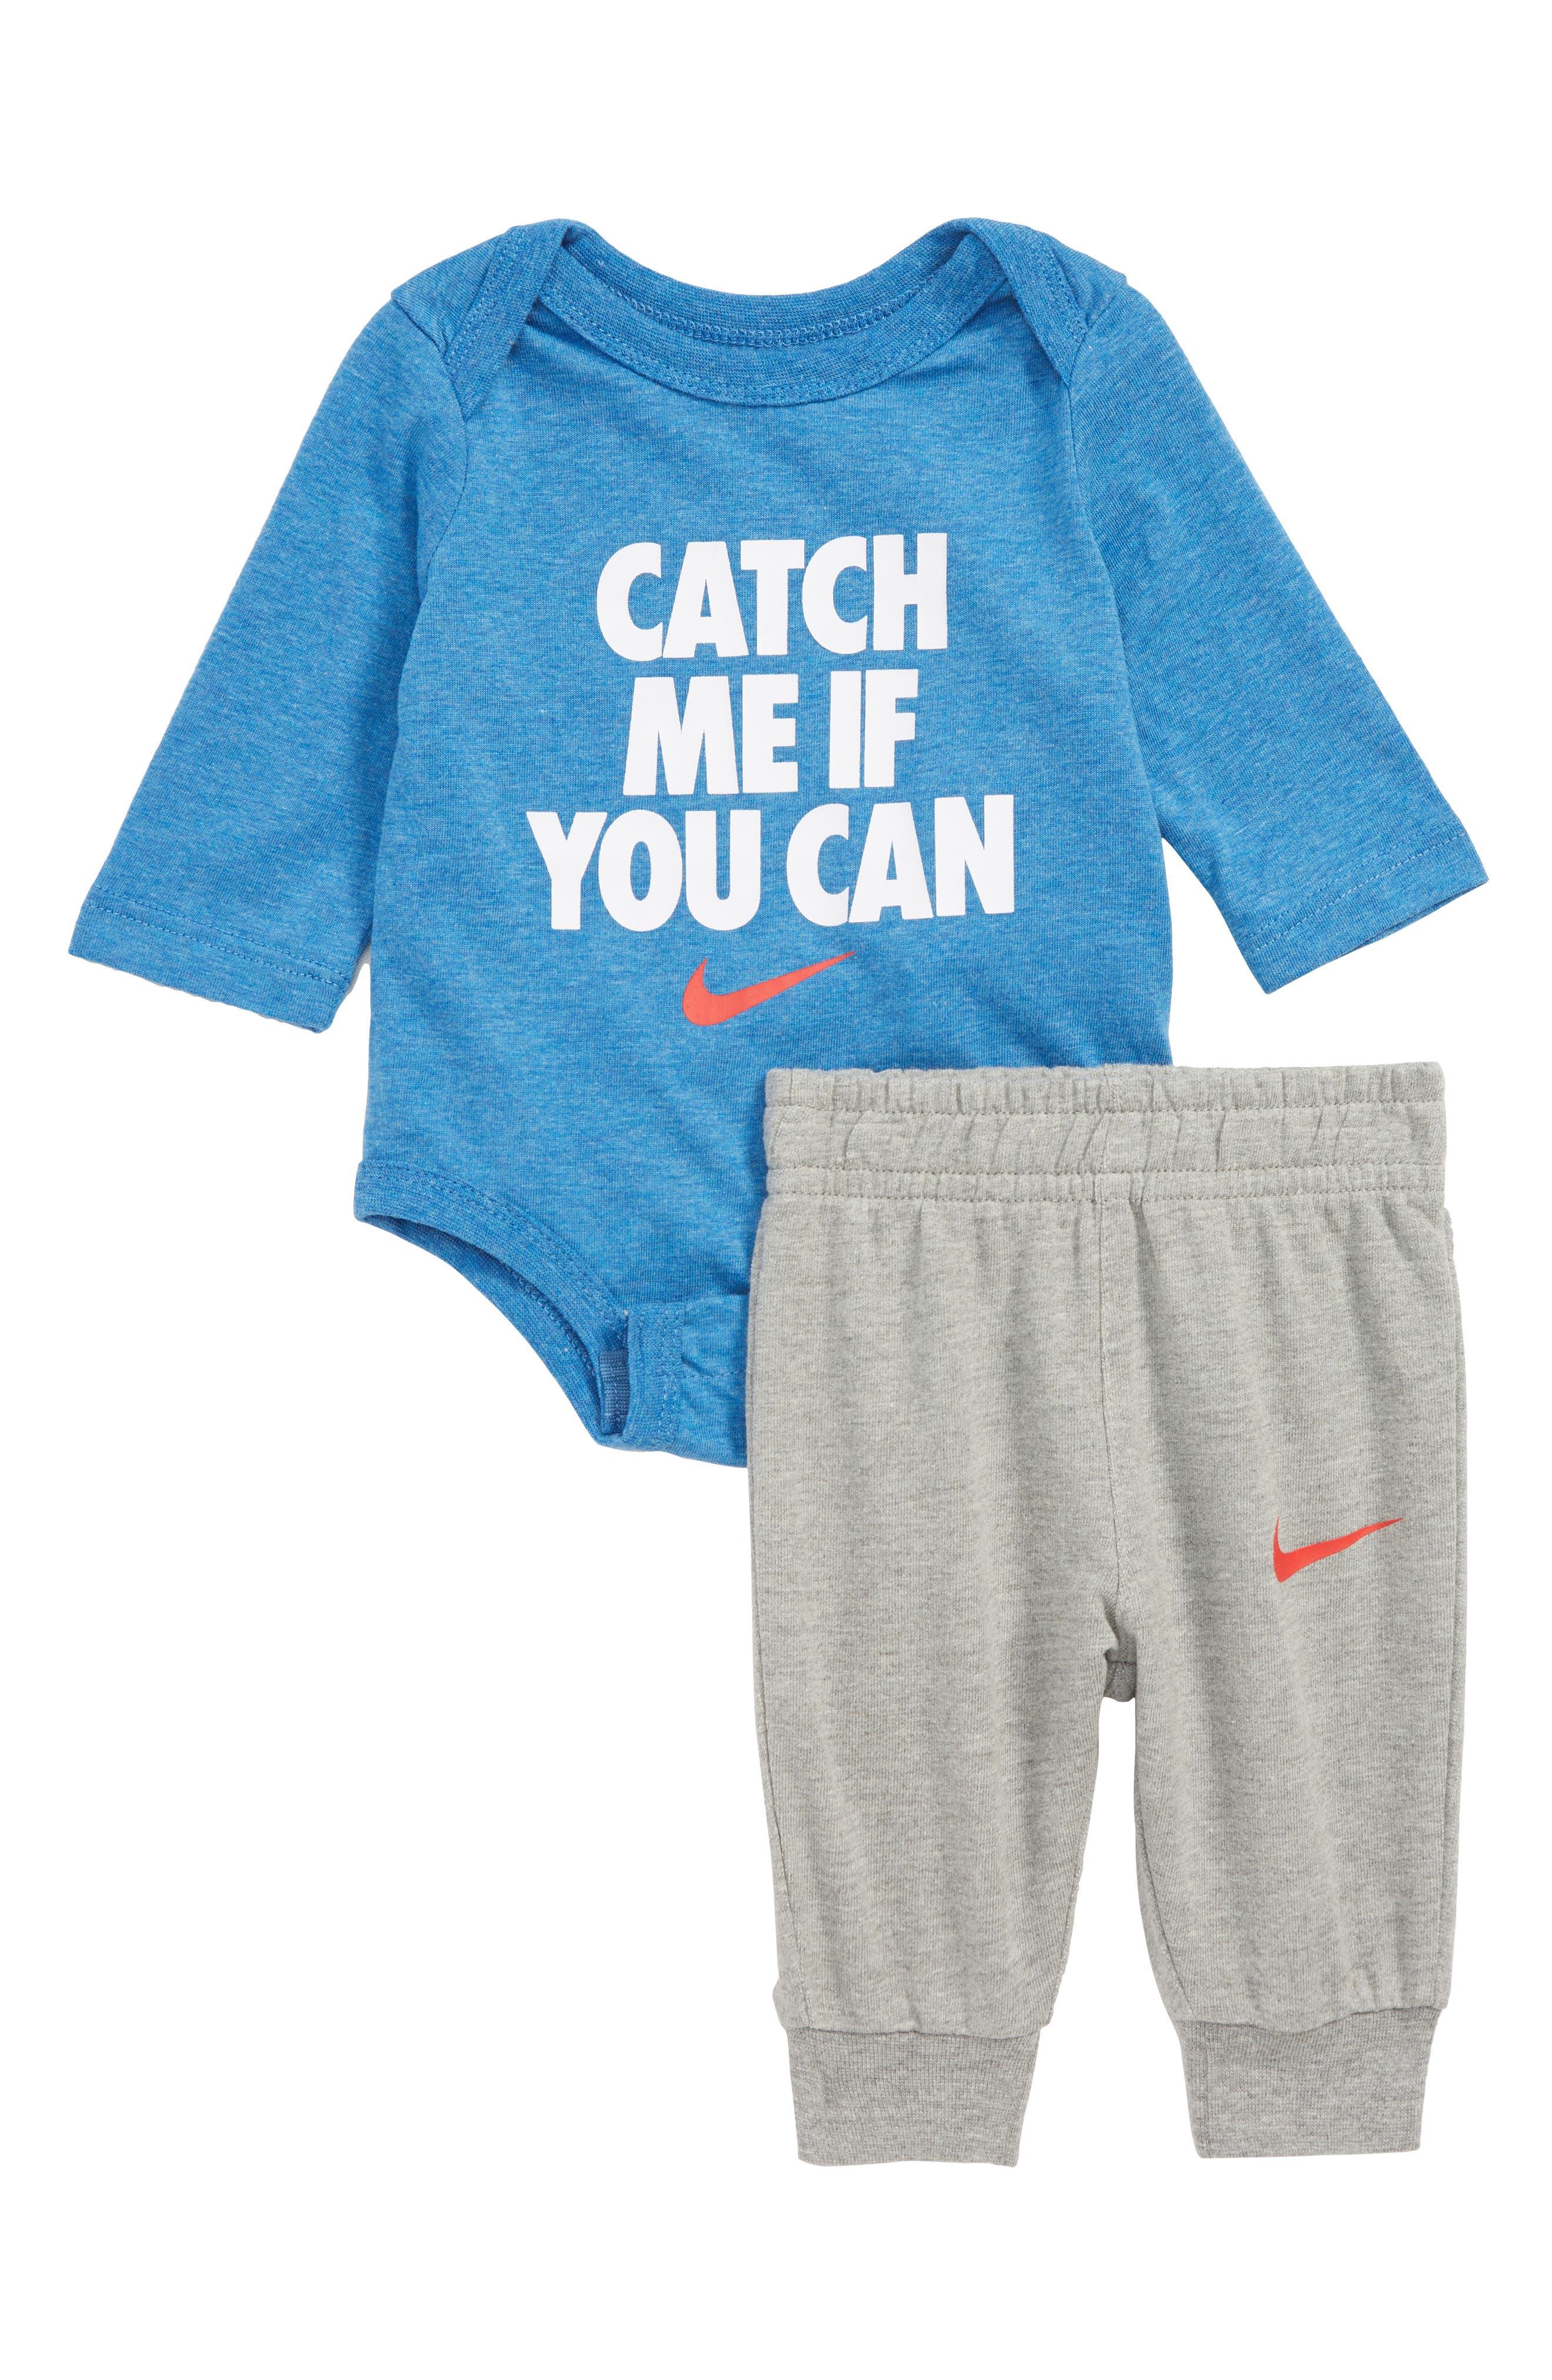 Catch Me If You Can Bodysuit & Pants Set,                             Main thumbnail 1, color,                             088